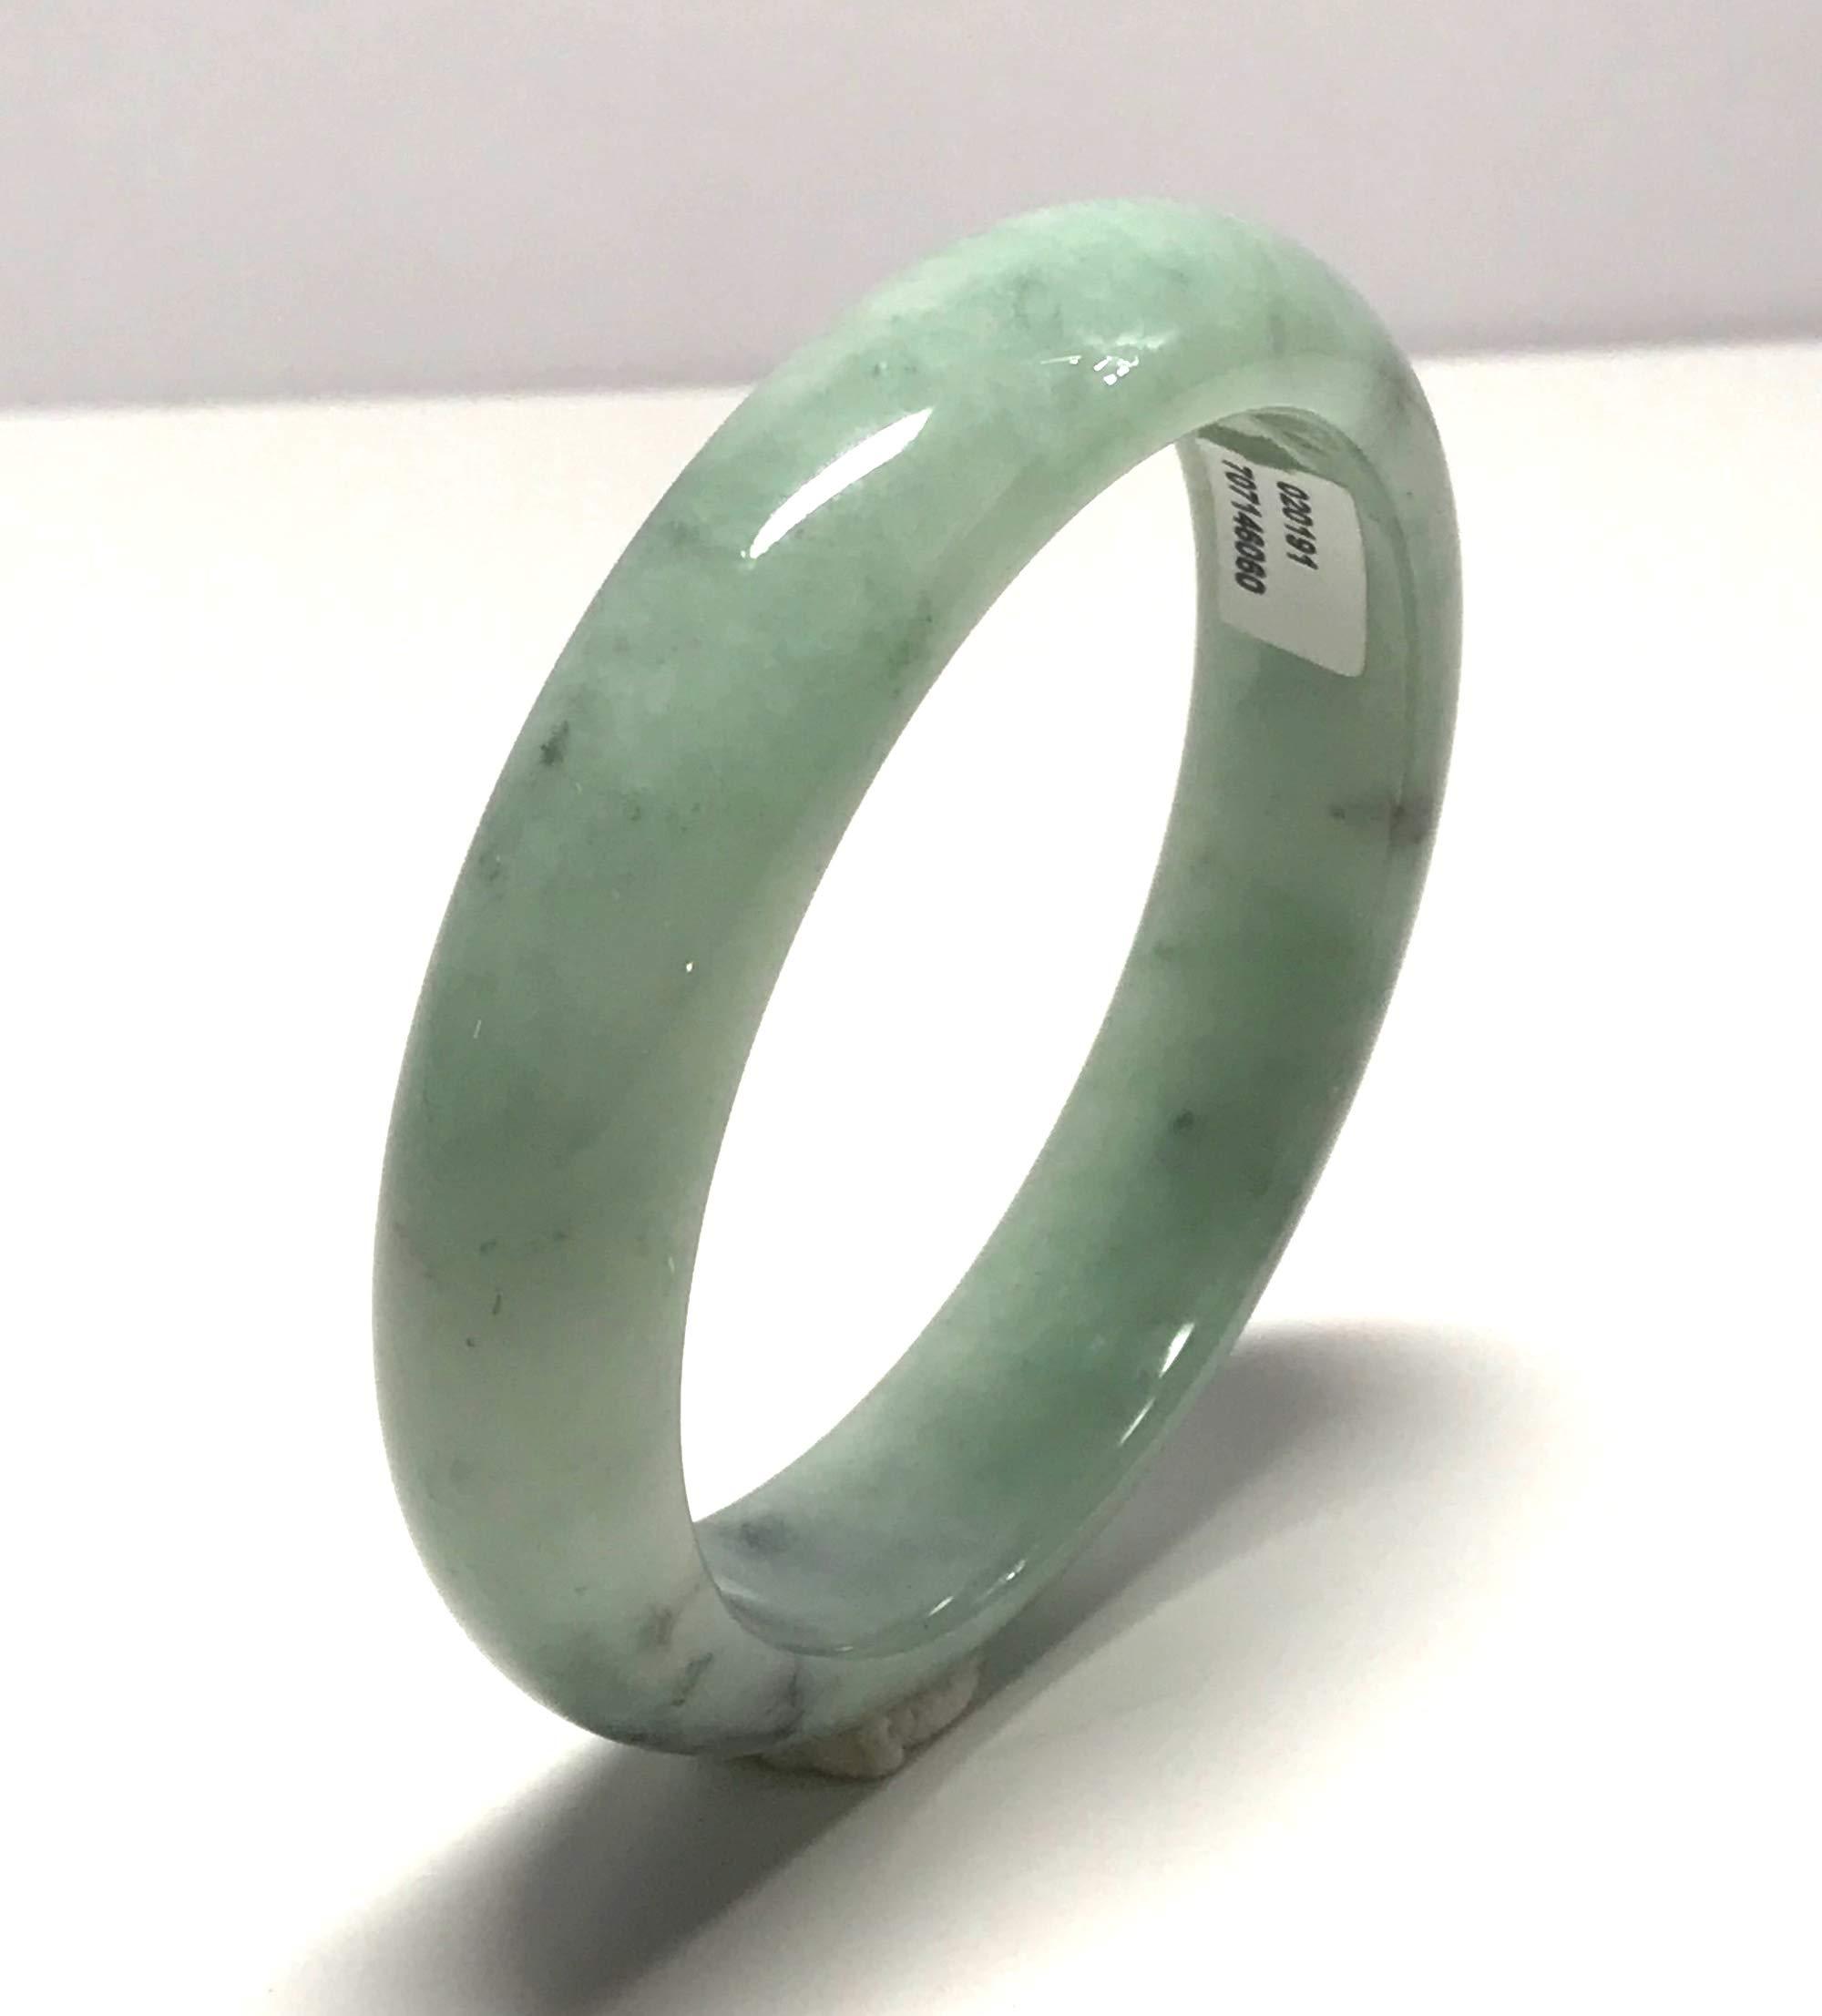 Certified Green 100% Natural A Burmese Gems Myanmar Jadeite Bangle Bracelet 61mm TA20001